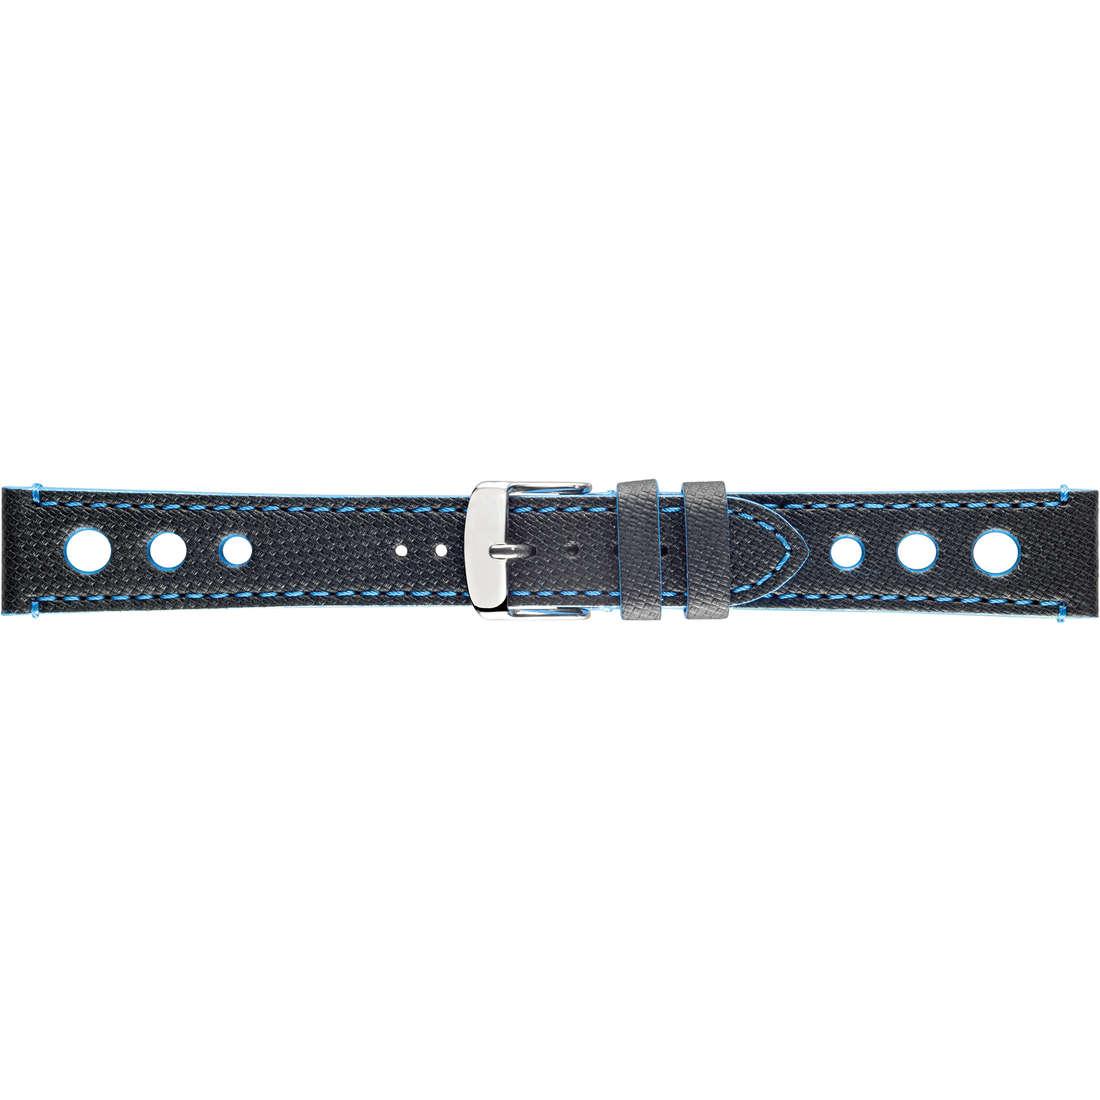 watch watch bands watch straps man Morellato Linea Sport A01X4498B24866CR20